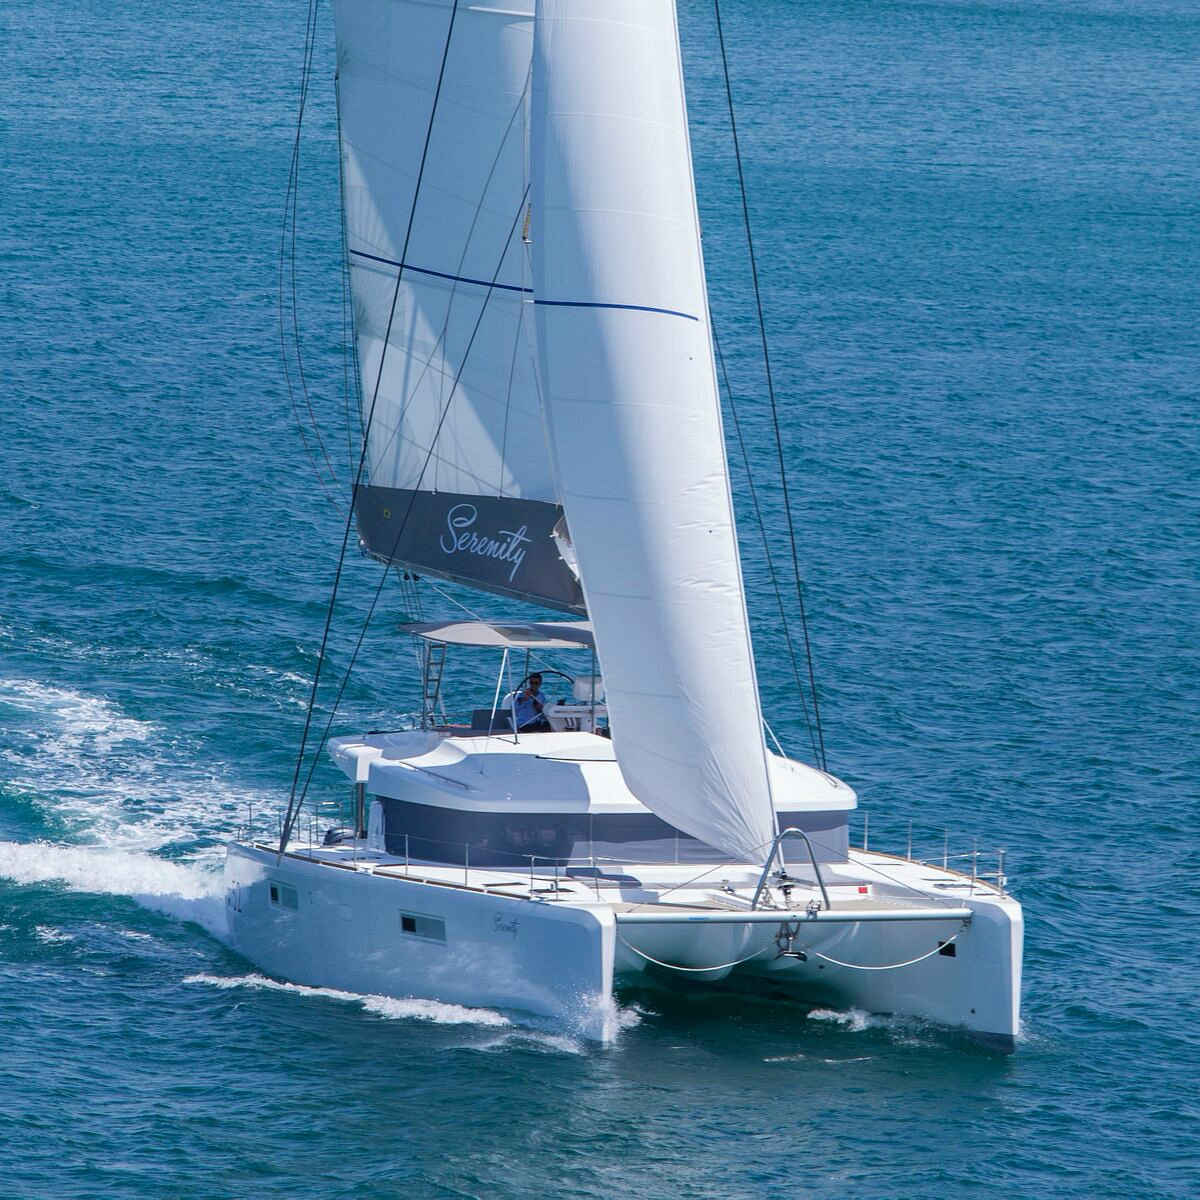 Lagoon Catamaran SERENITY - Main Shot